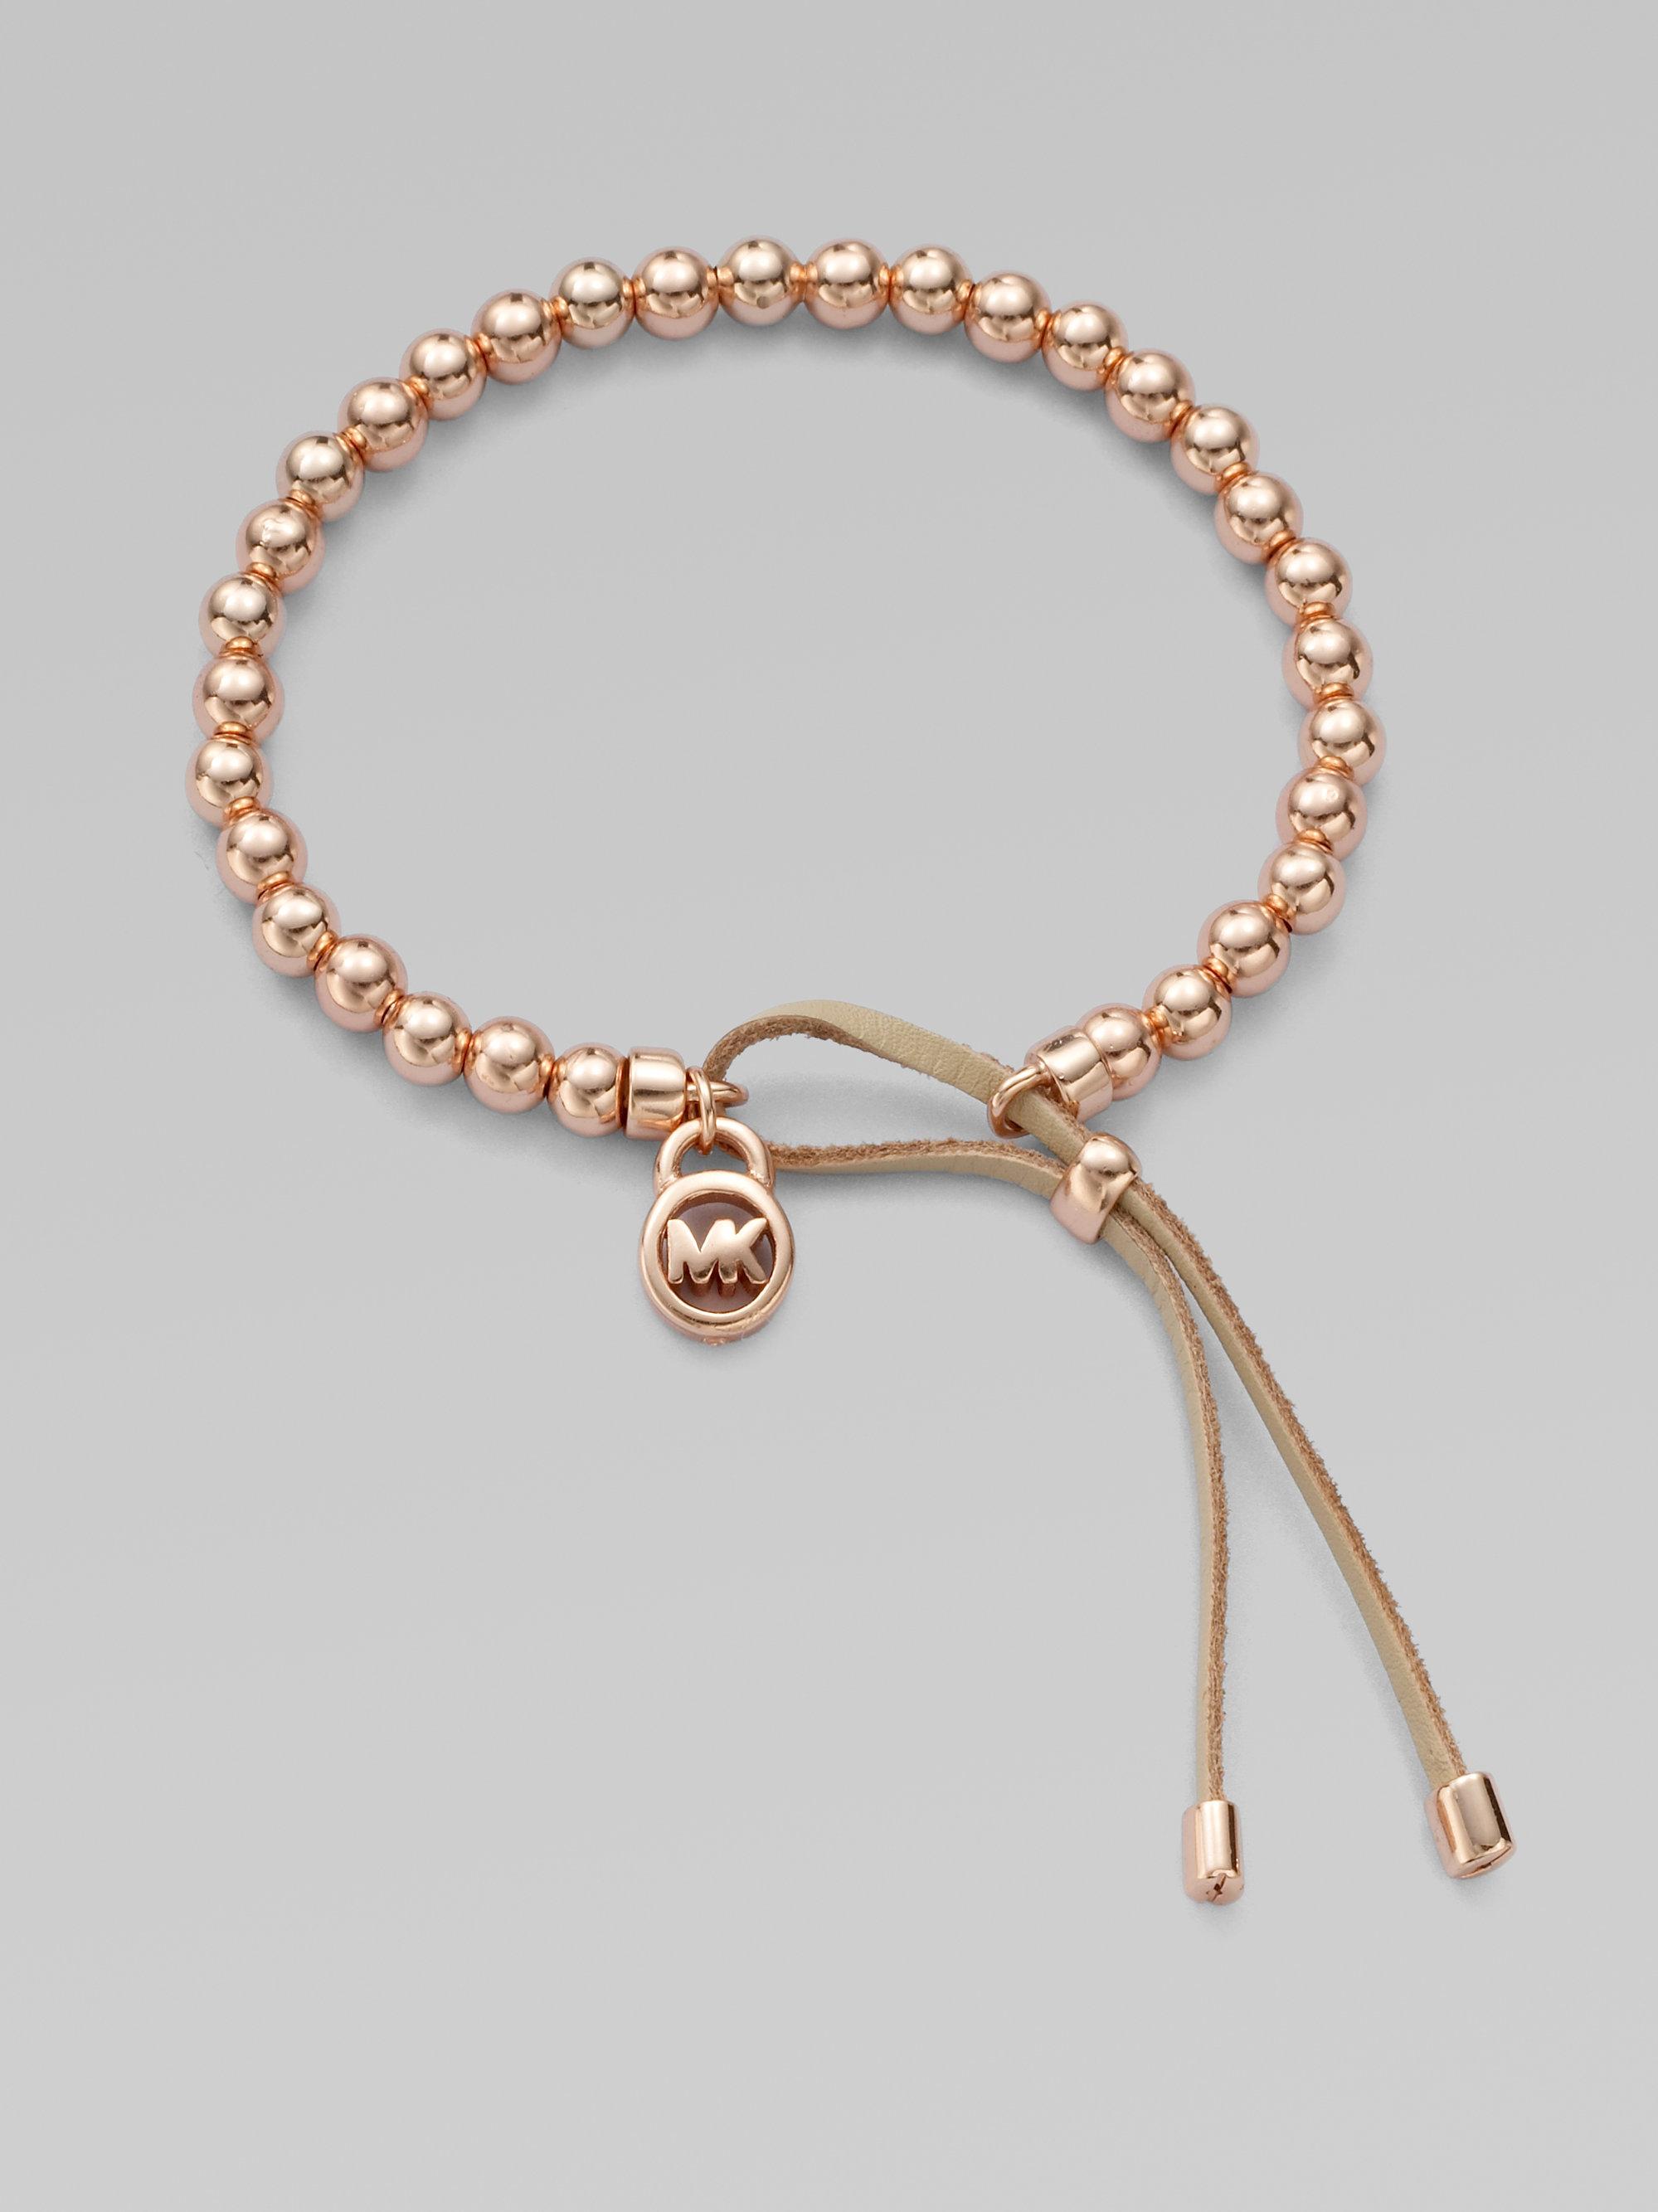 5d67ac8dcc39 Lyst - Michael Kors Leather Accented Beaded Bracelet rose Goldtone ...